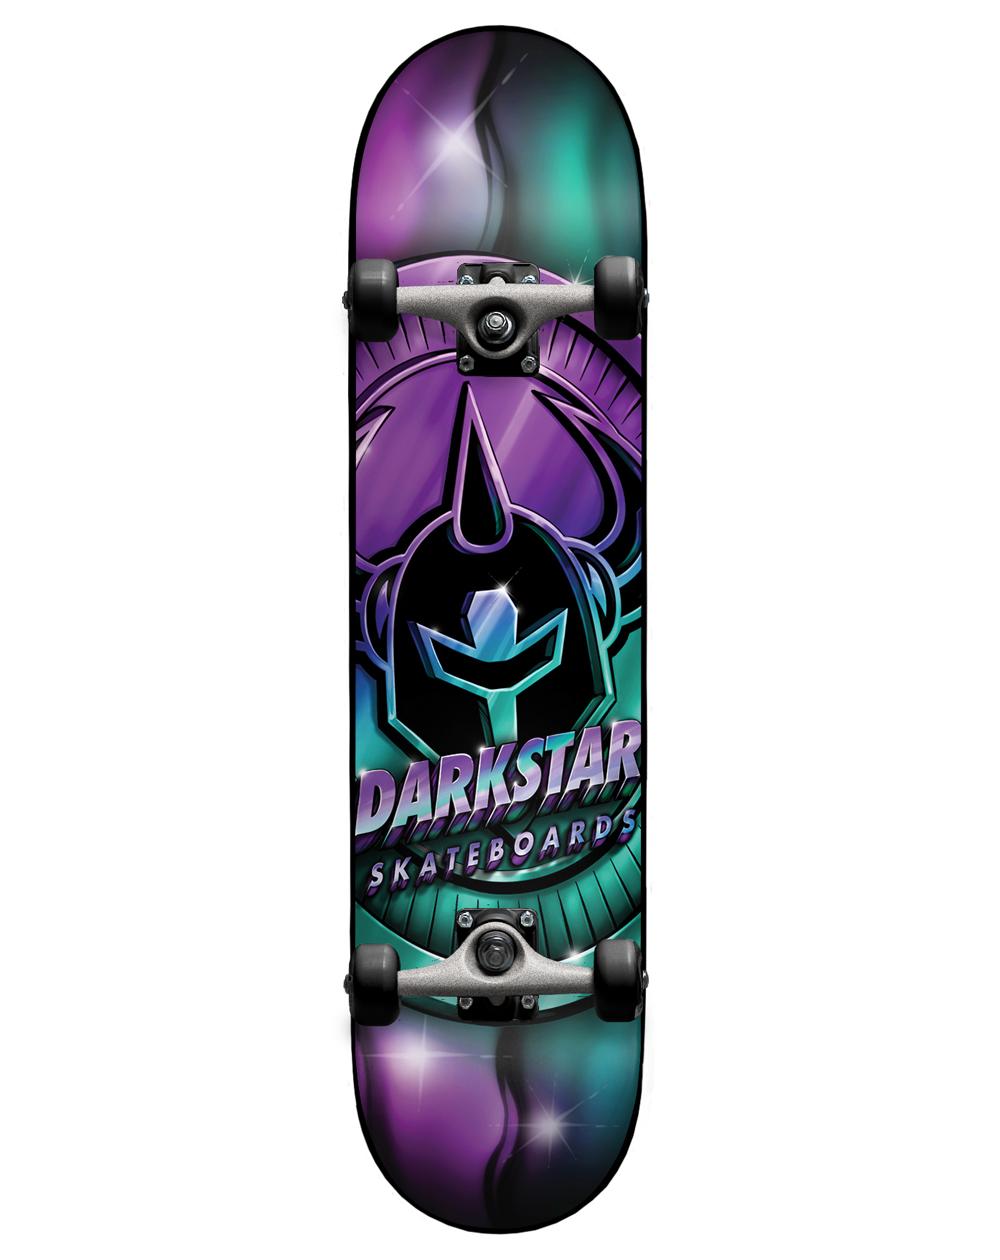 "Darkstar Skateboard Anodize 8"" Aqua/Purple"